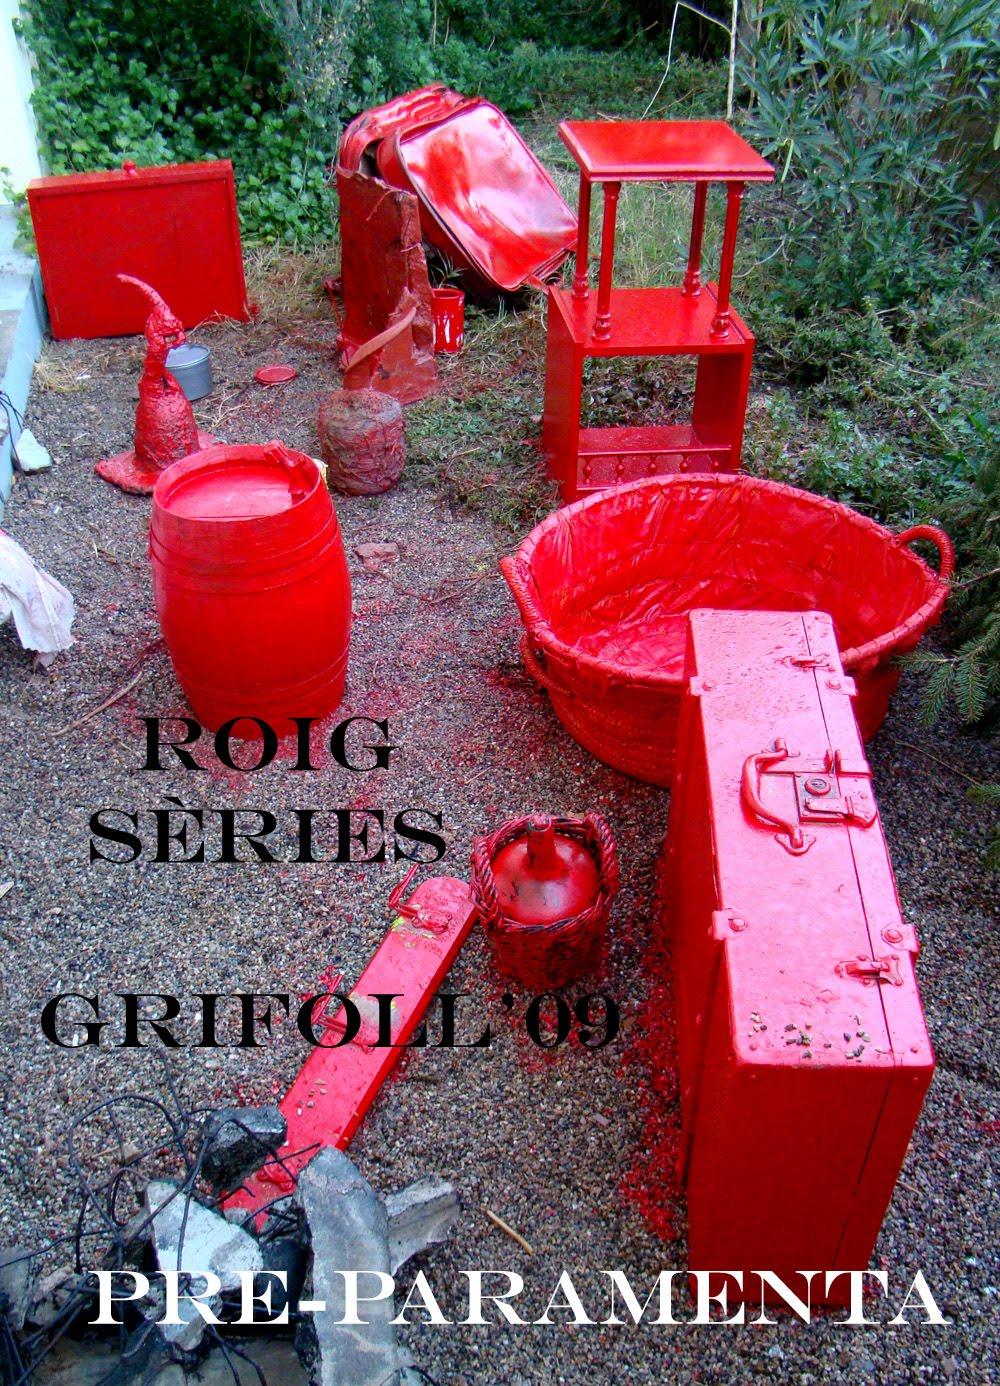 [ROIG-+Taller+Grifoll'09.+prepara+menta]